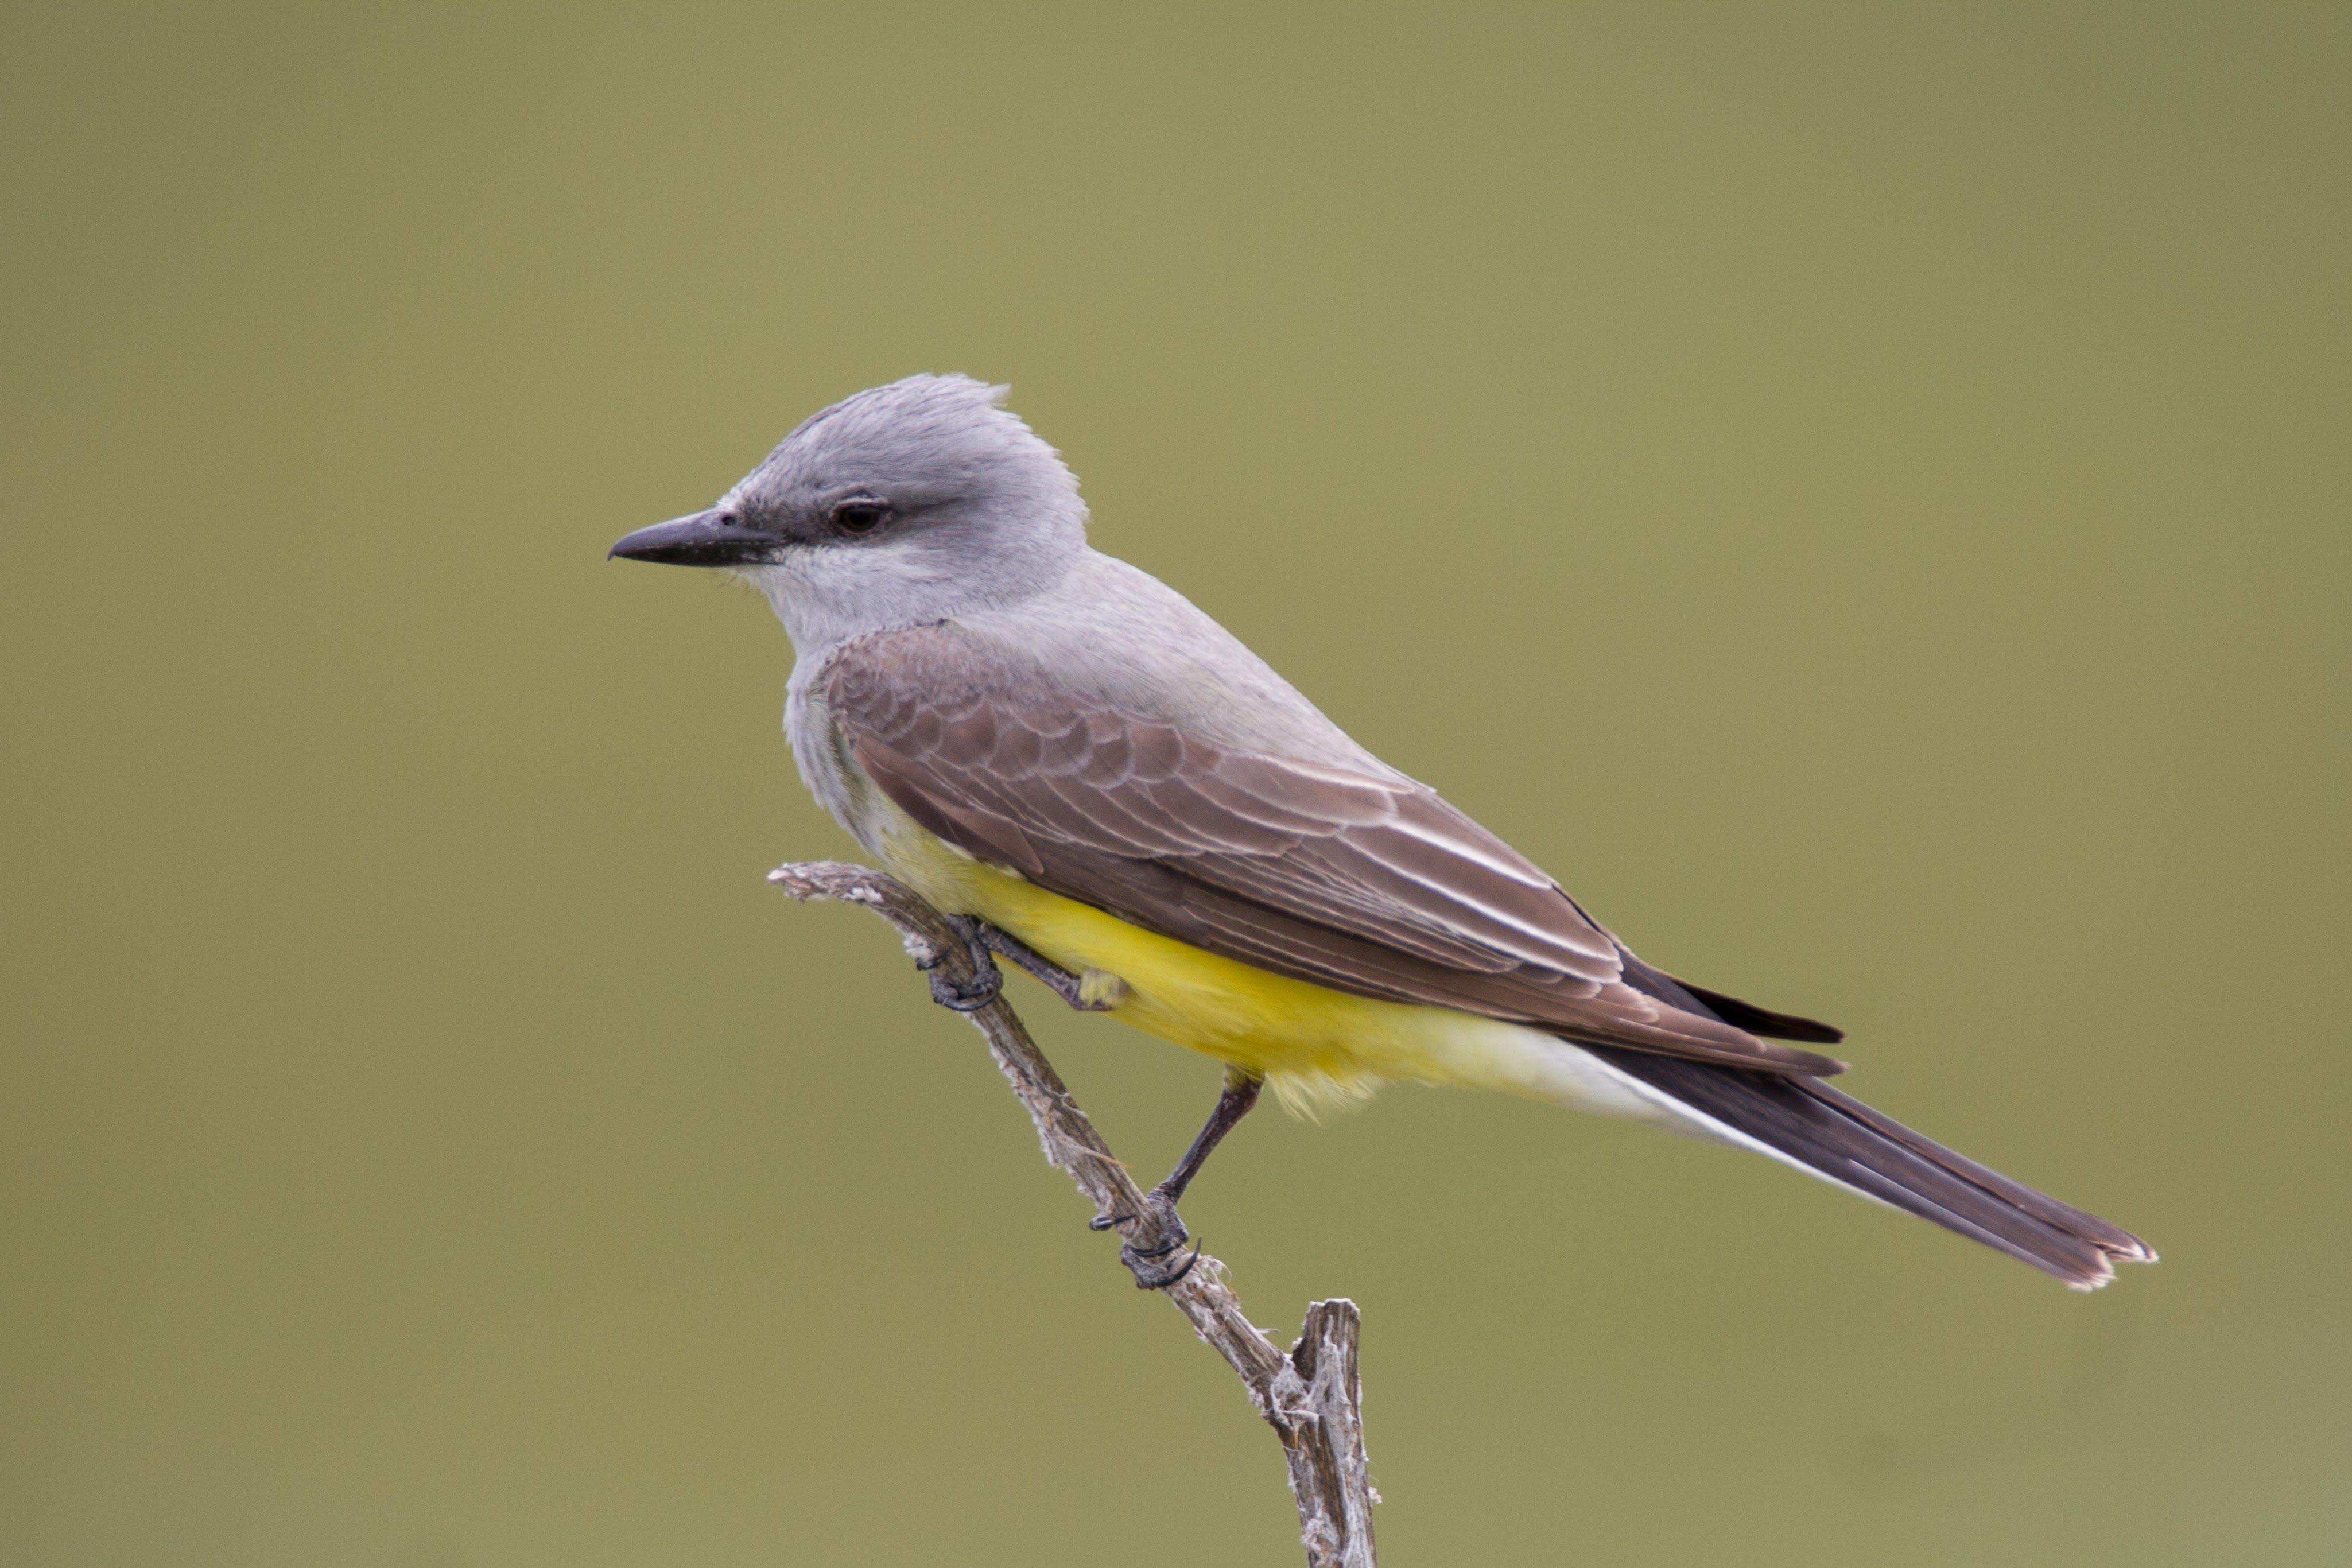 Western Kingbird Courtesy & © Jose Pacheco, Photographer